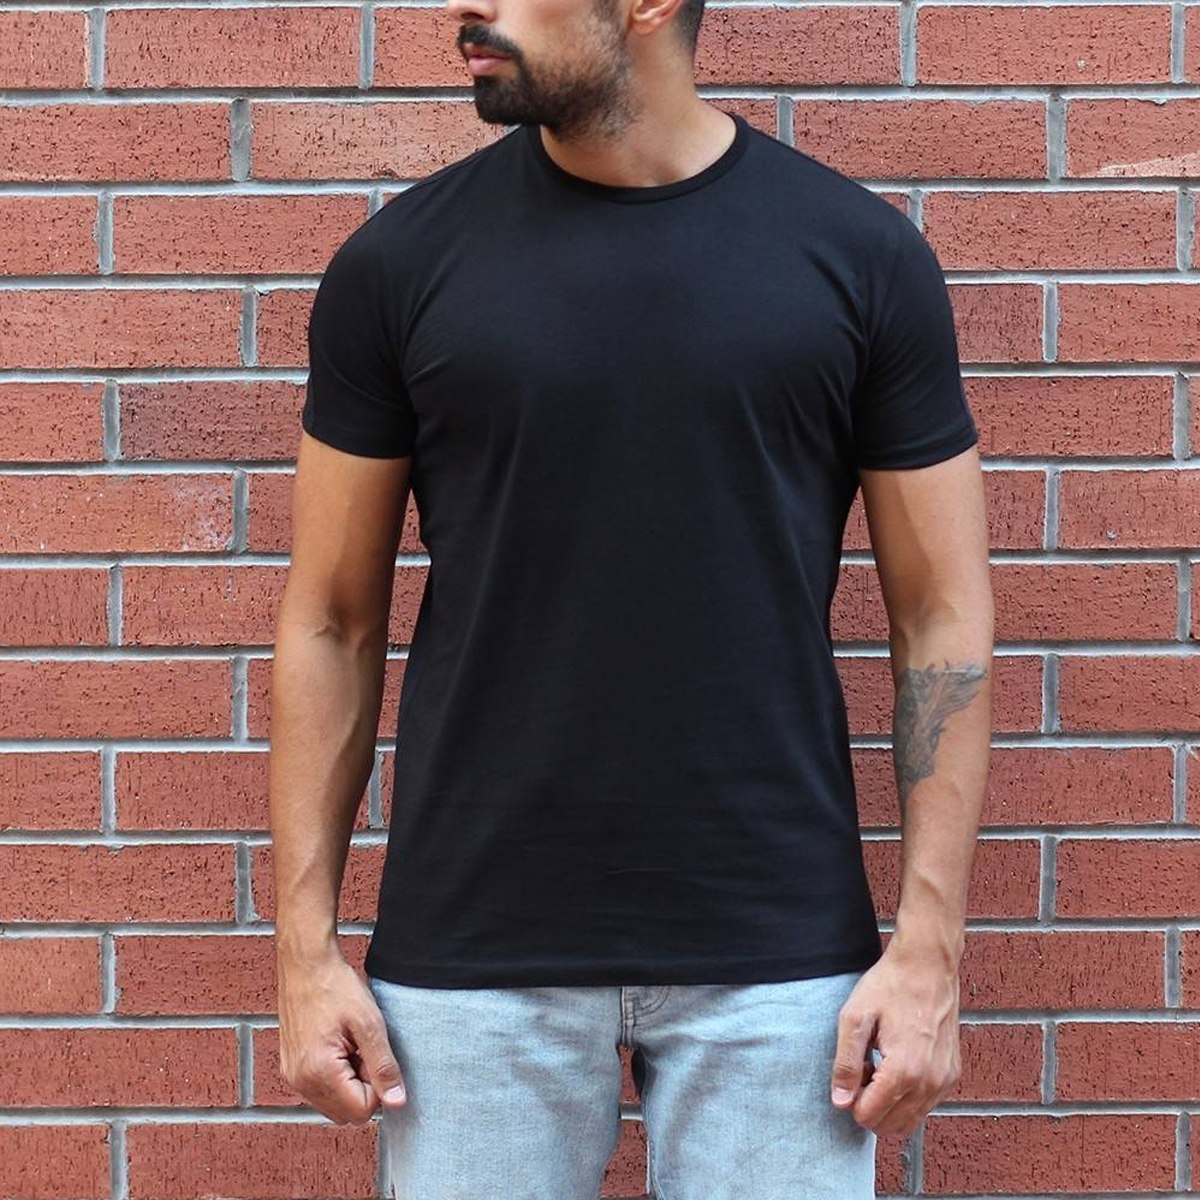 Men's Round Neck Stylish Basic T-Shirt Black